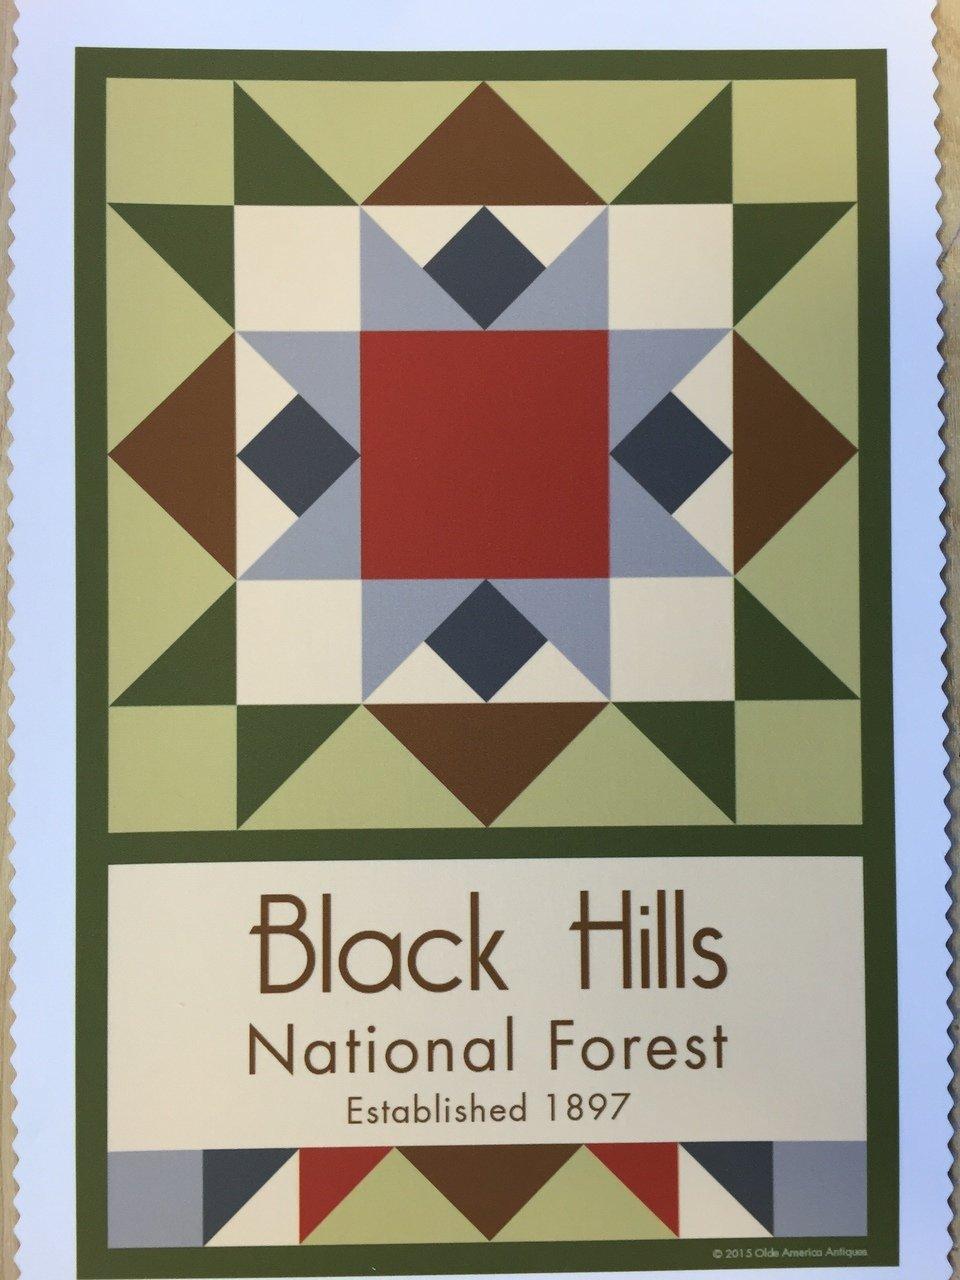 Black Hills National Forest quilt block